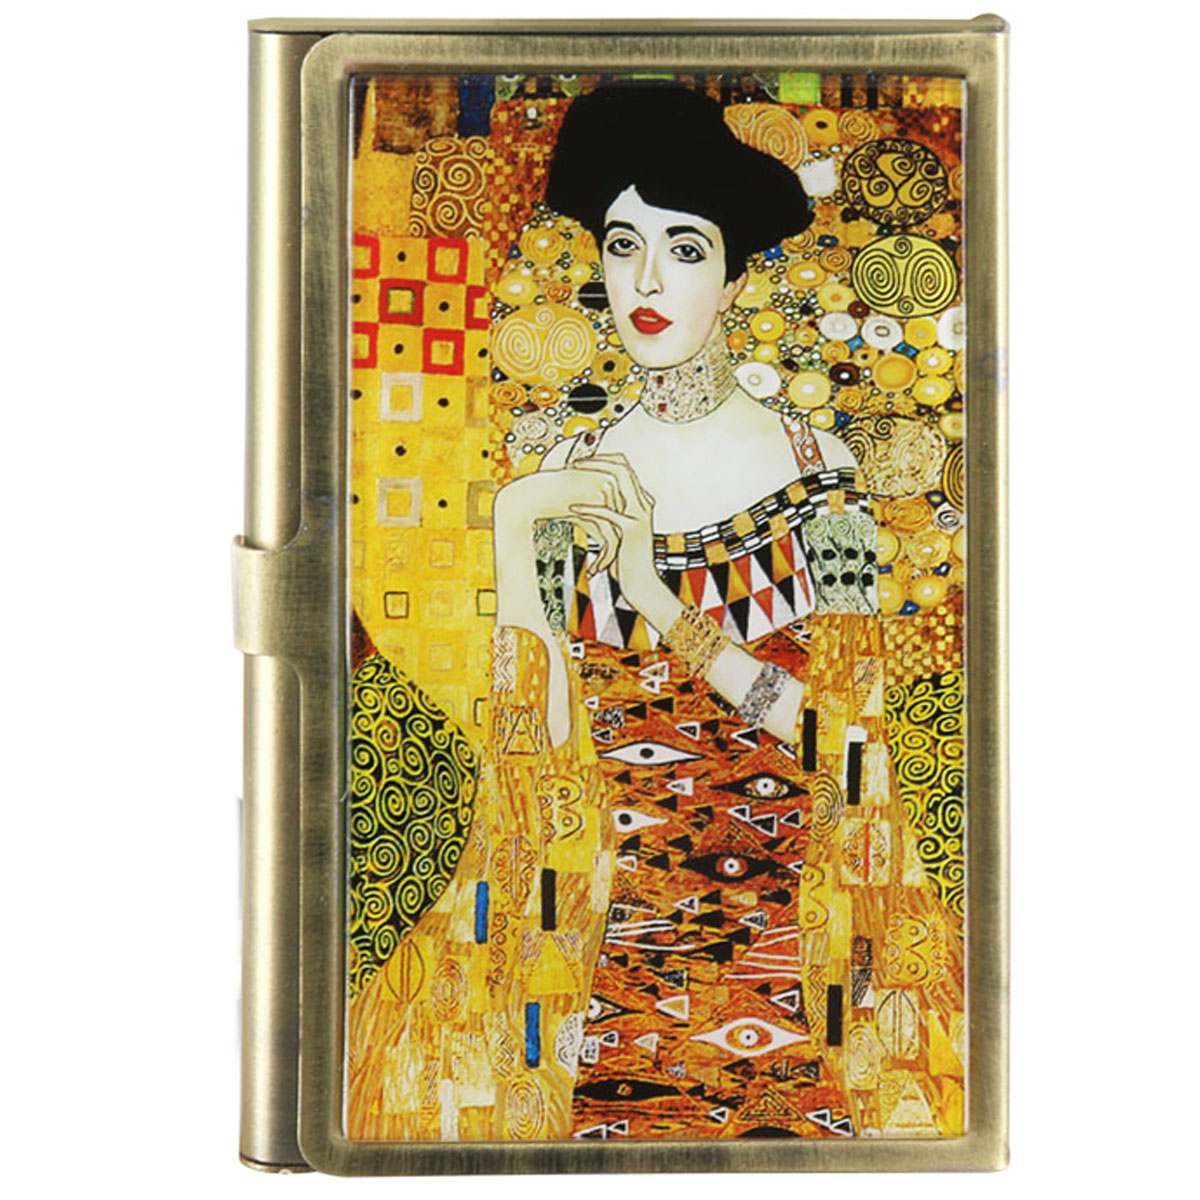 Porte-cartes \'Gustav Klimt\' (Adèle) - 90x55 mm - [Q7221]